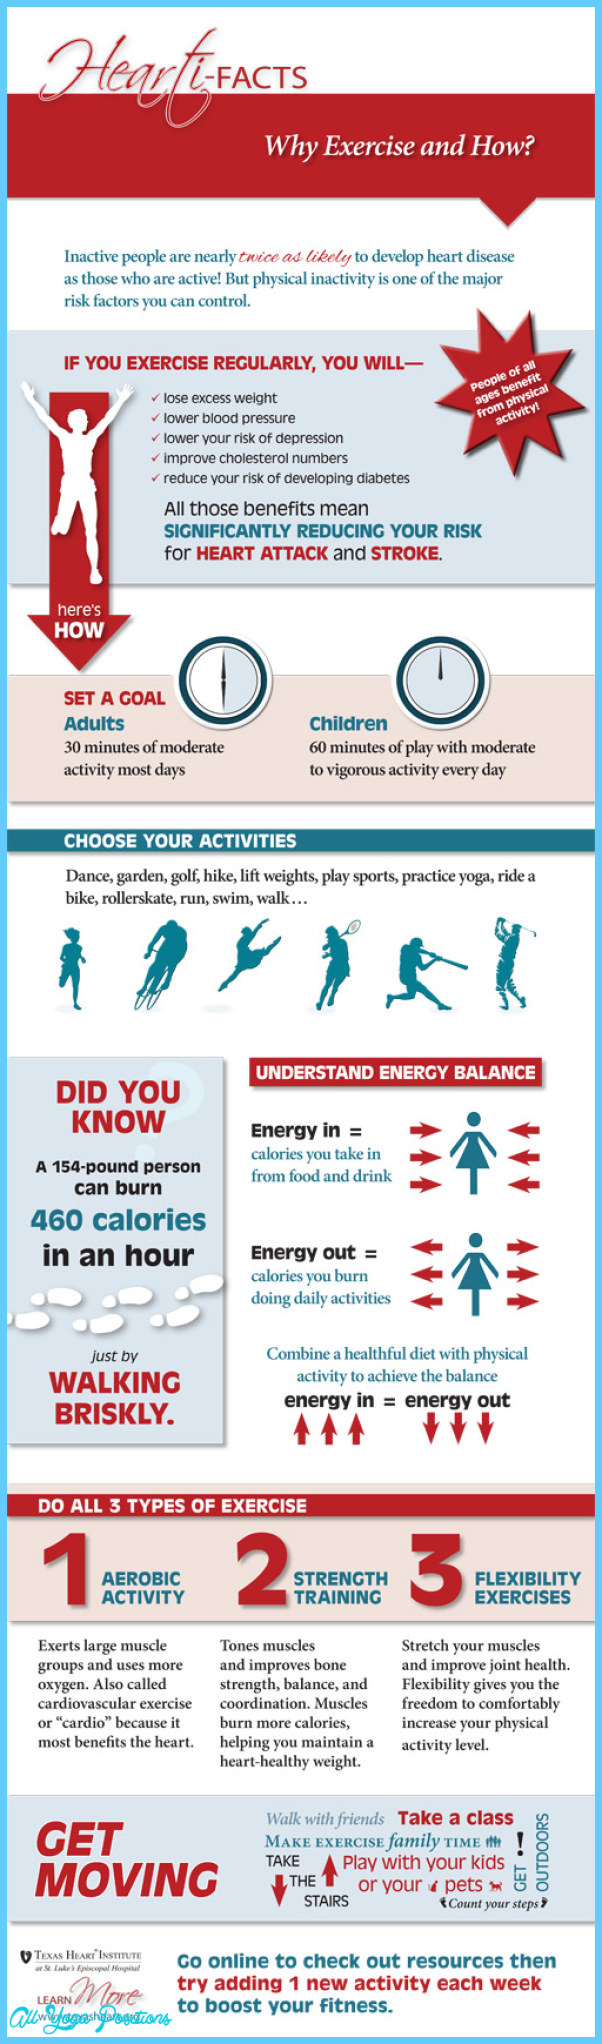 THI_infographic_exercise_web500.jpg